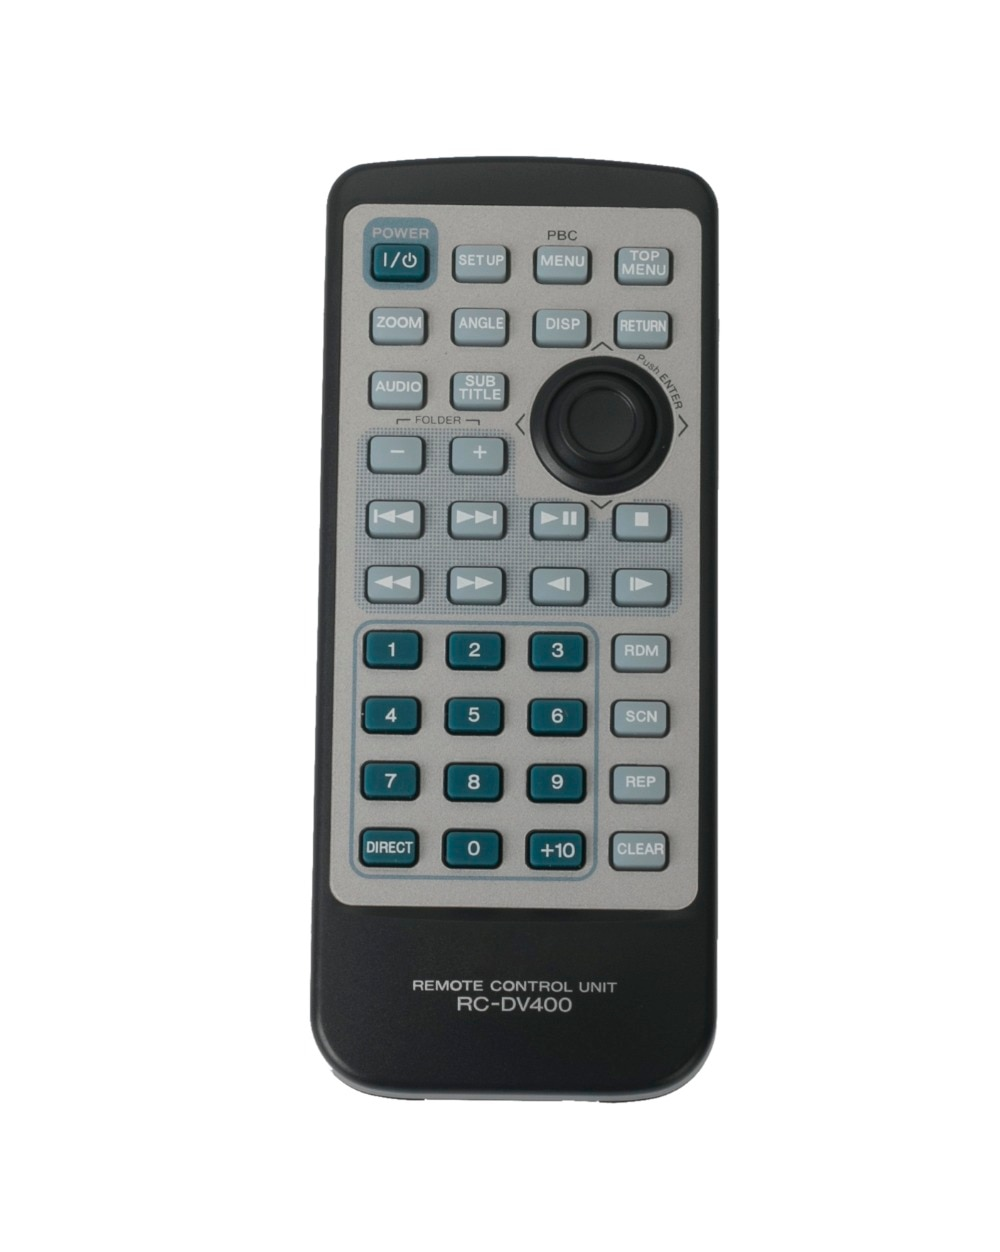 Nuevo RC-DV400 control remoto se adapta para Kenwood DVD coche DVD sistema receptor RC-DV430 RC-DV400 DDX6019 DDX6029 DDX6039 KDV-412 KDV-5